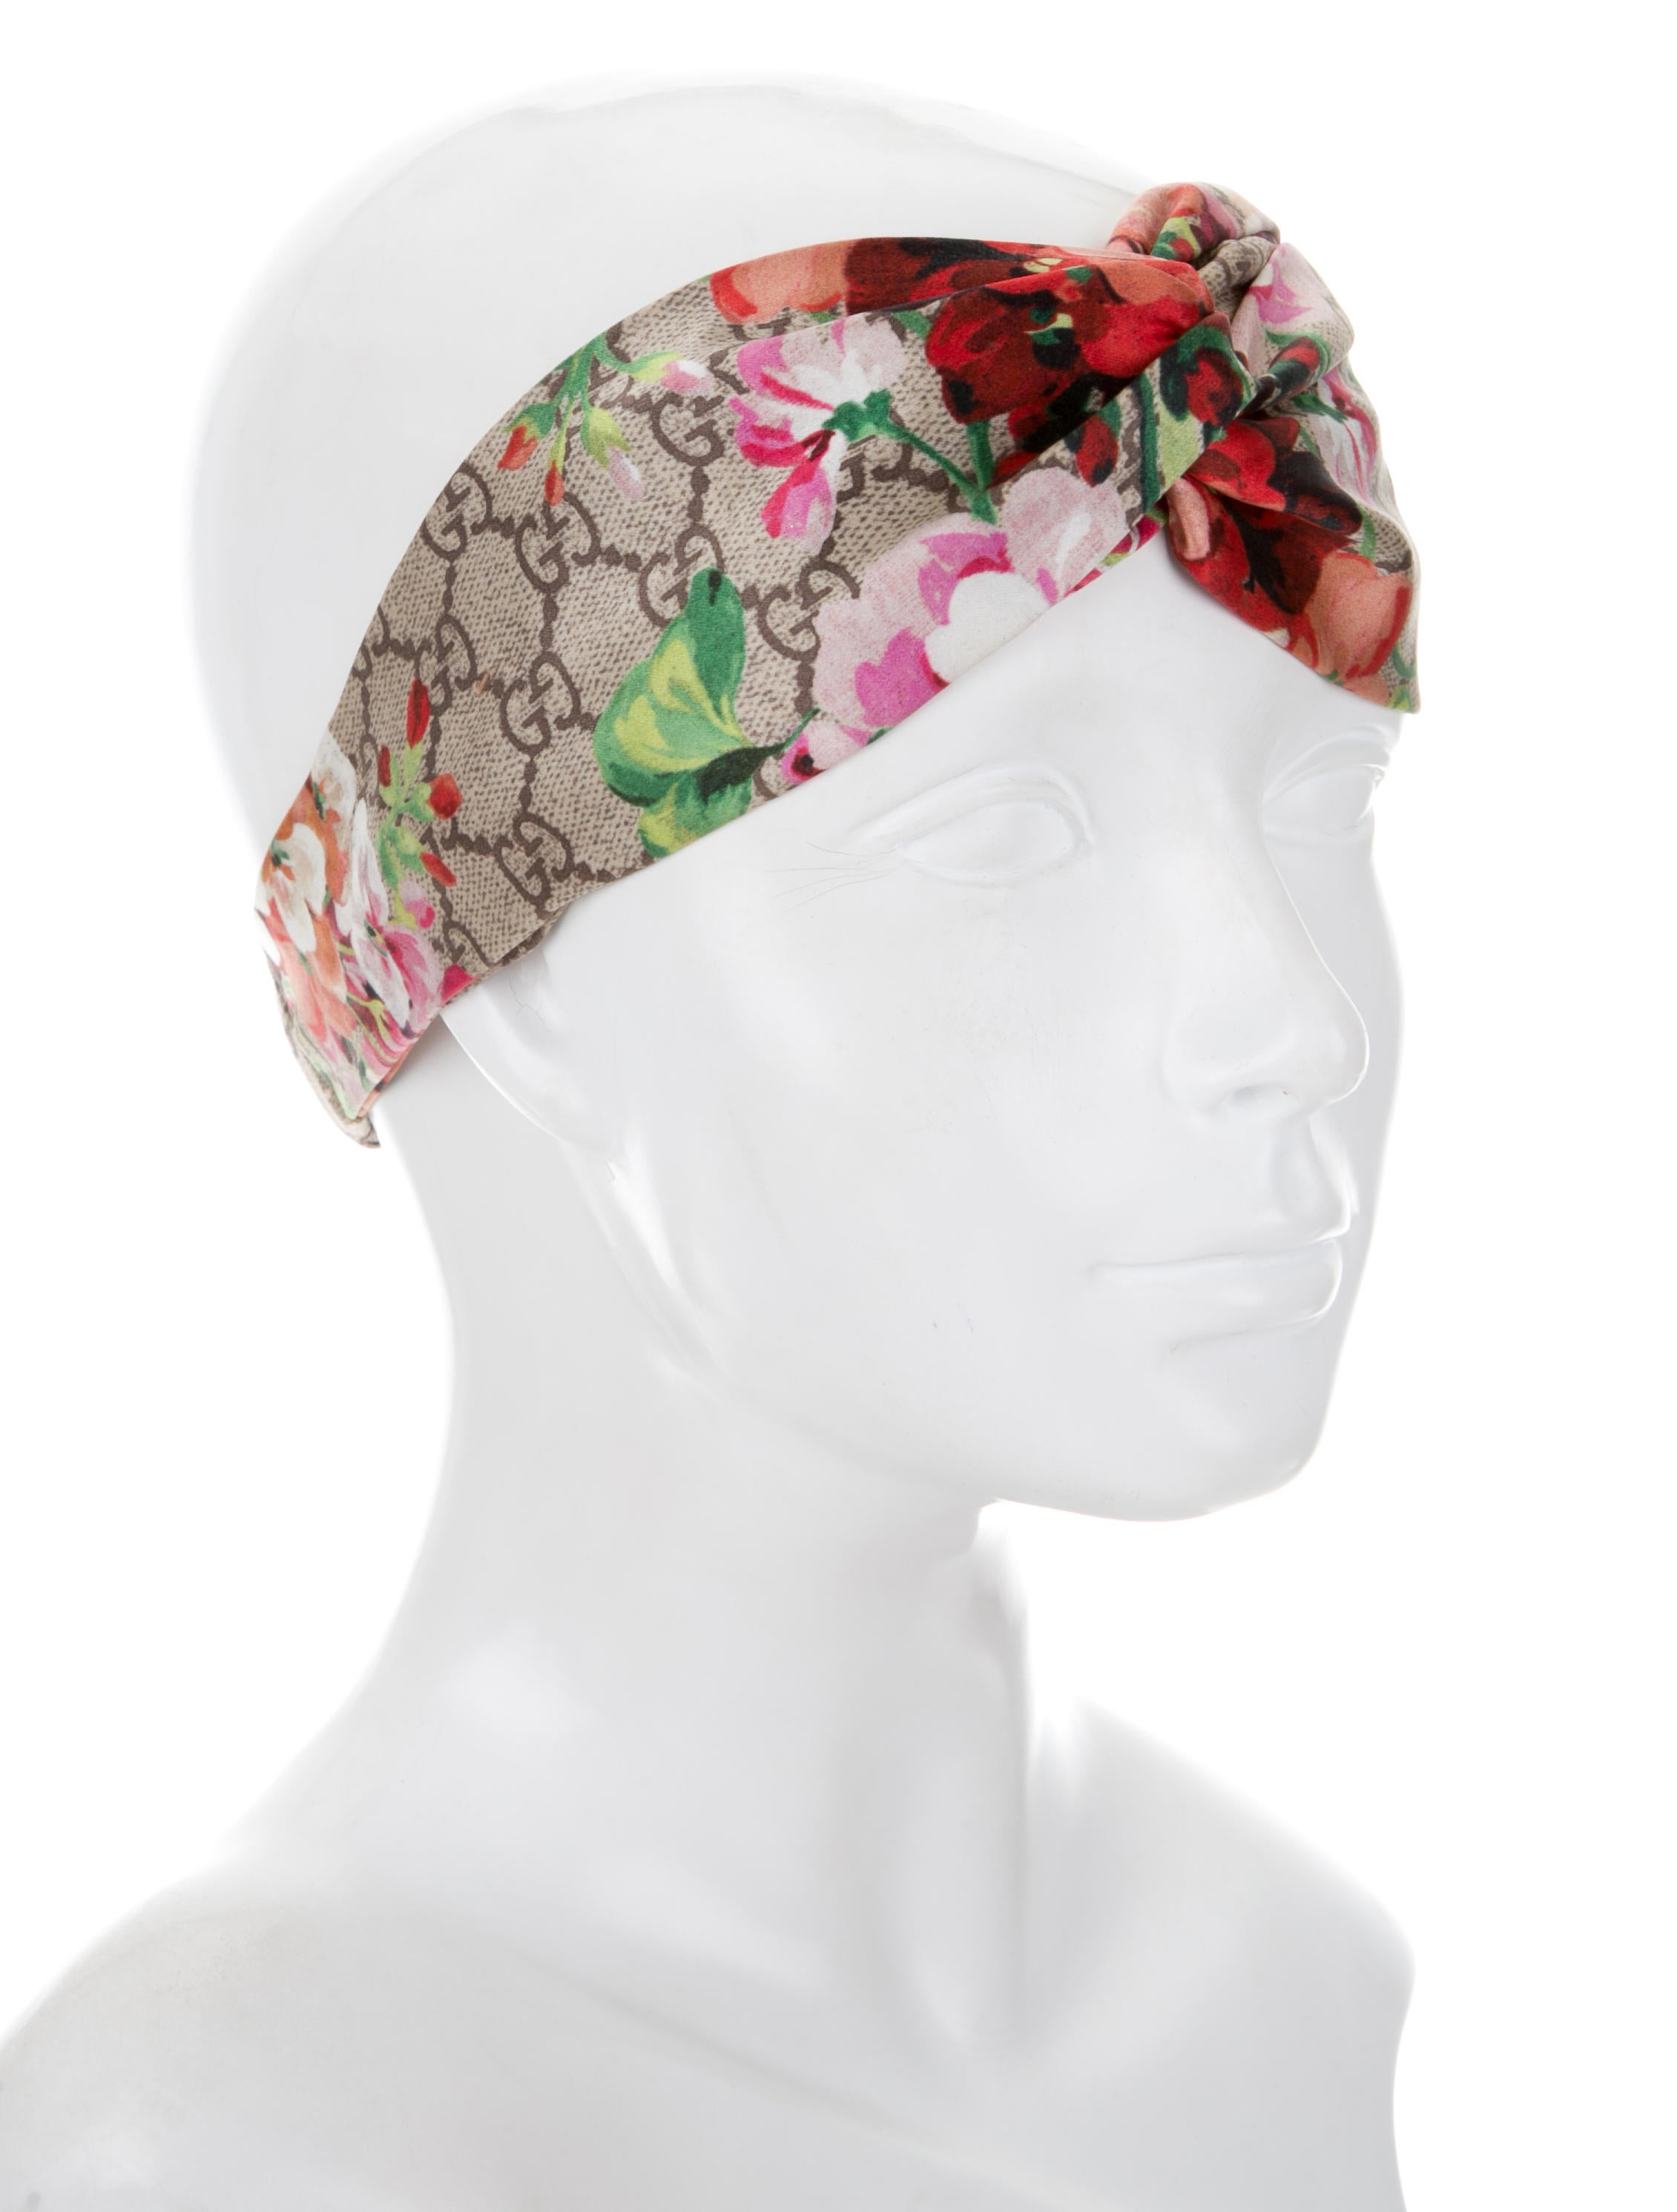 Gucci 2017 Silk Gg Blooms Headband Accessories